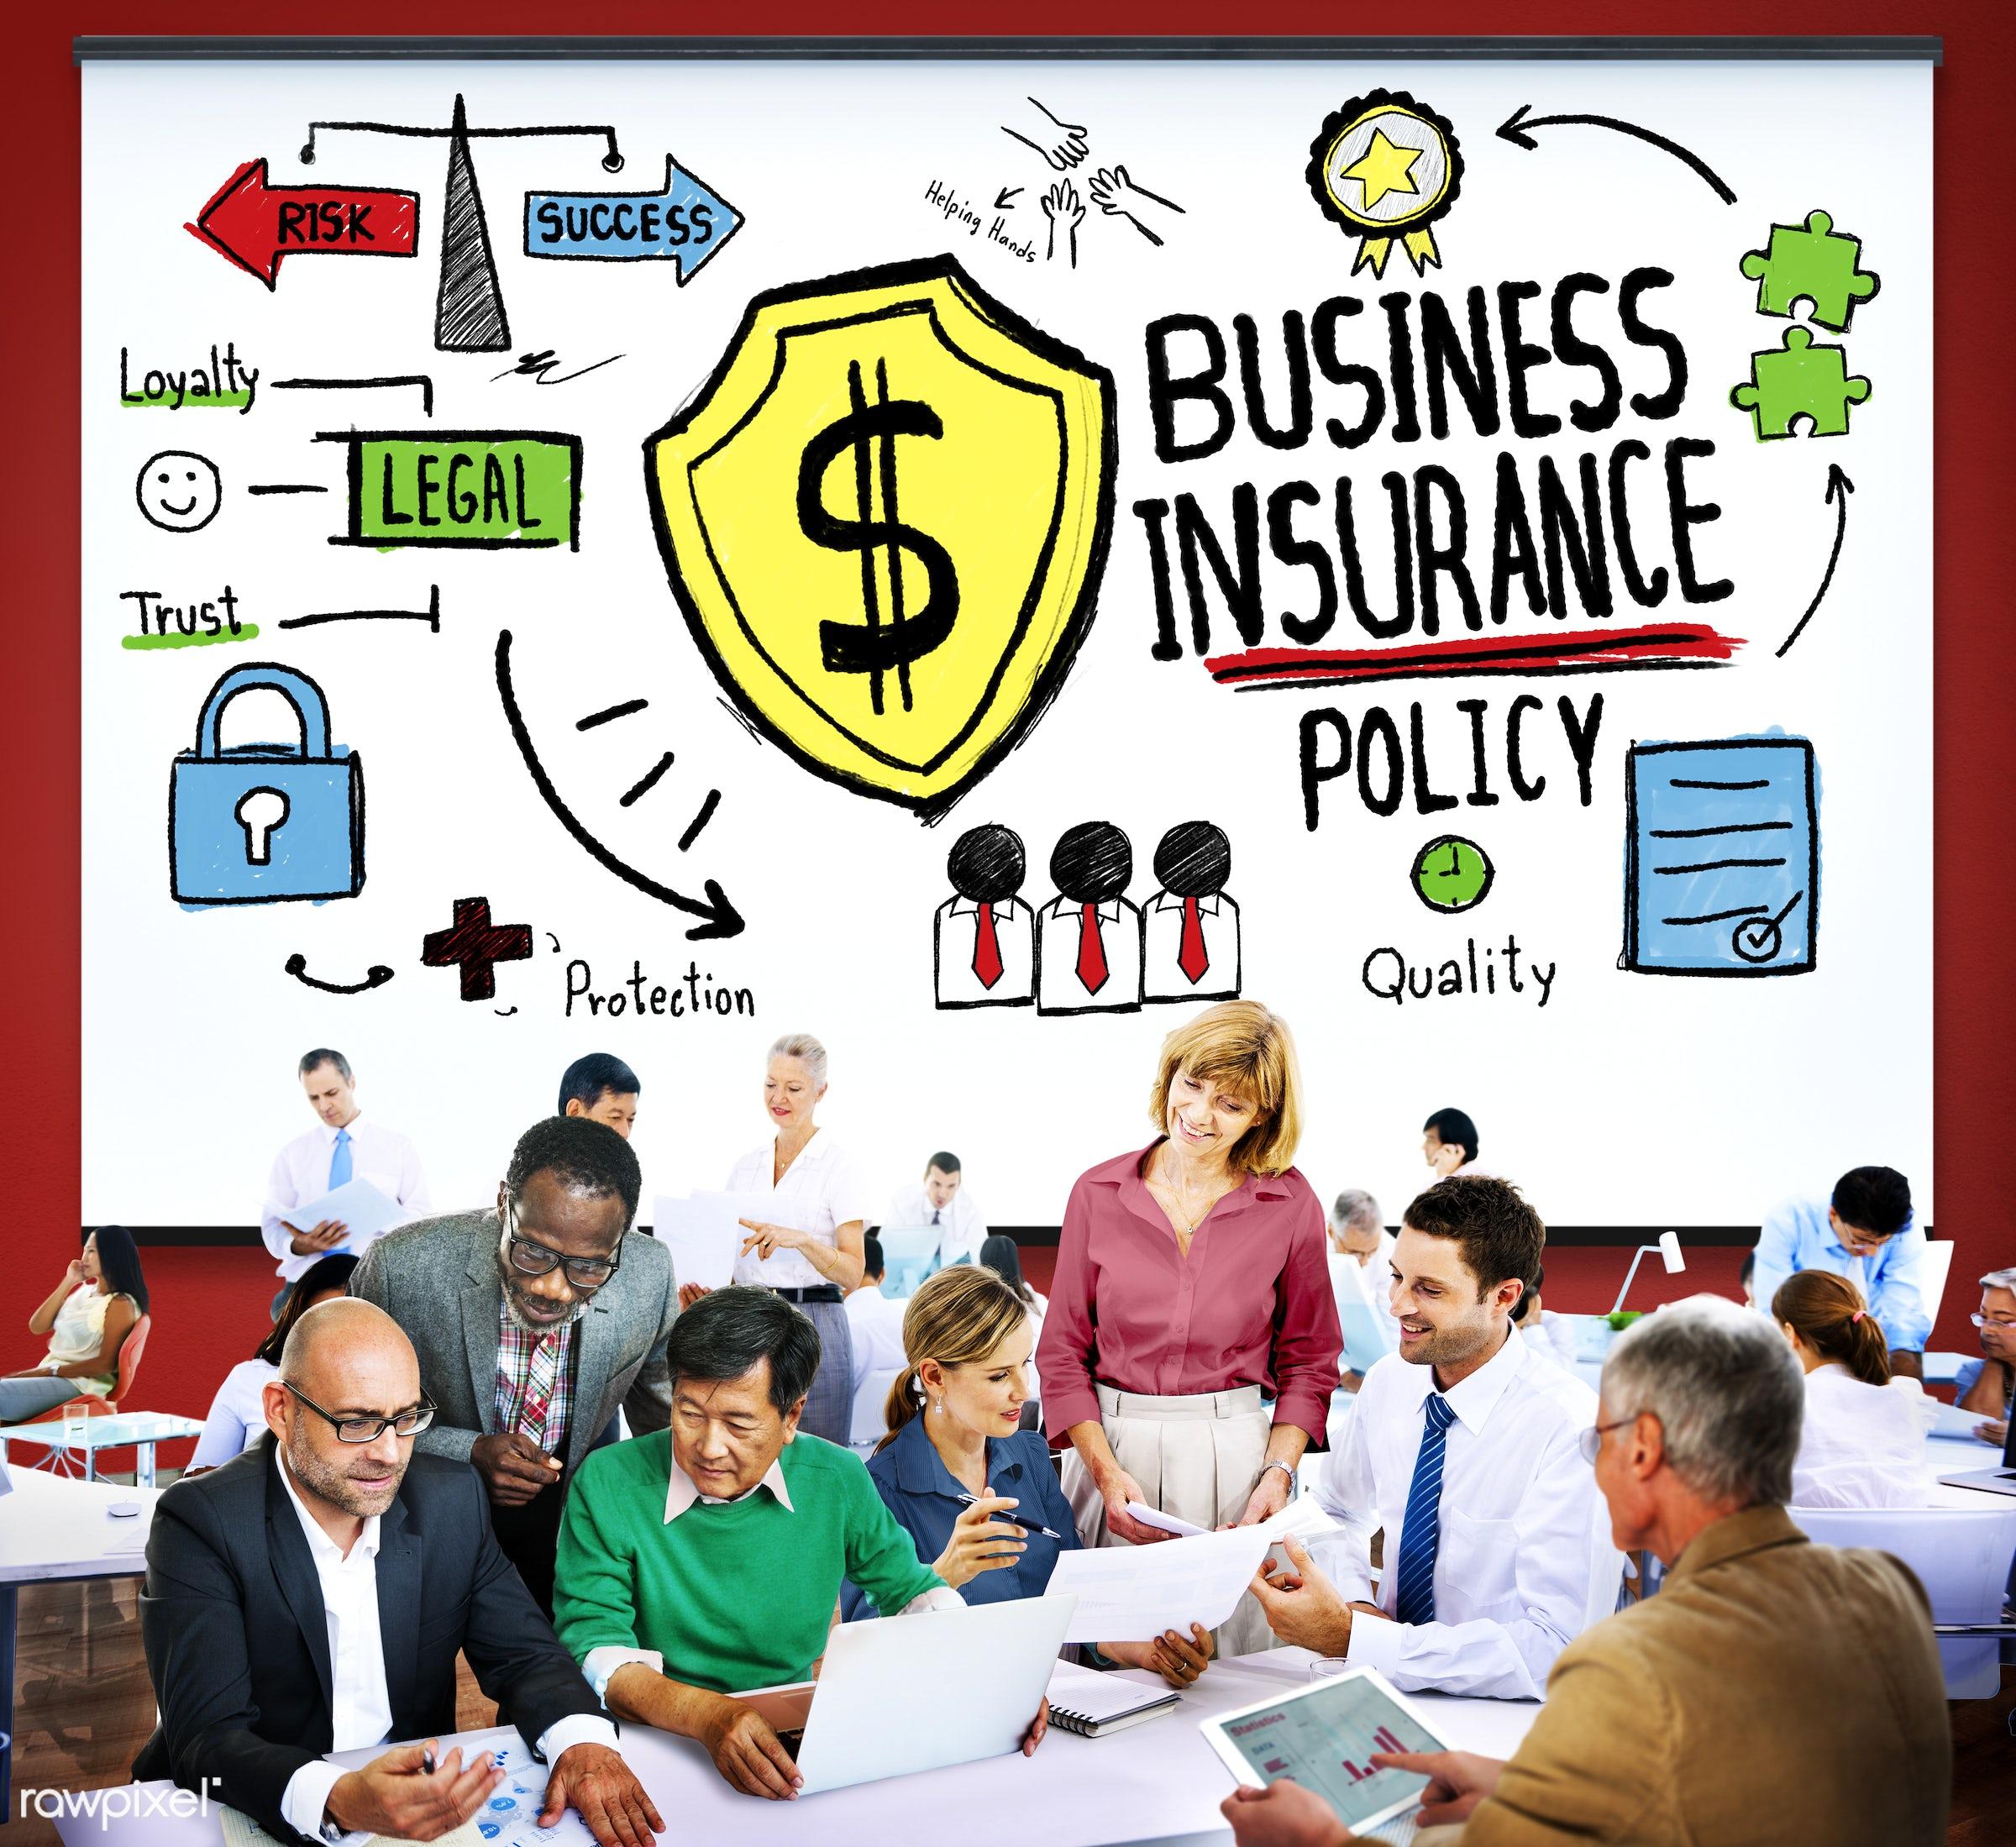 analysis, benefit, business, business insurance, business people, businessmen, businesswomen, busy, communication,...